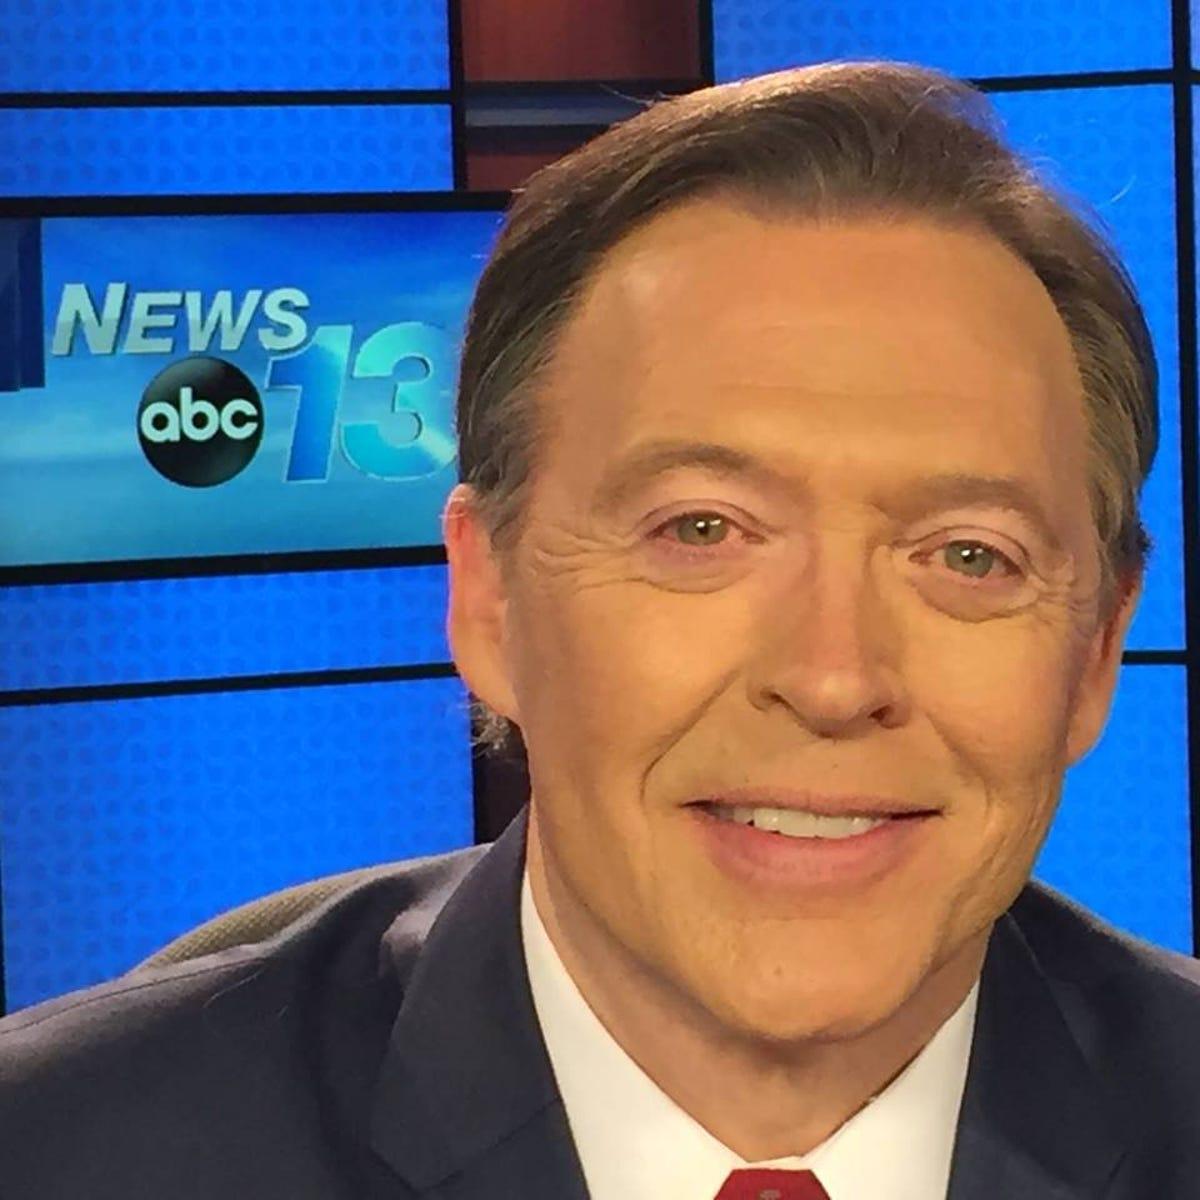 WLOS lets go longtime anchor Blunt